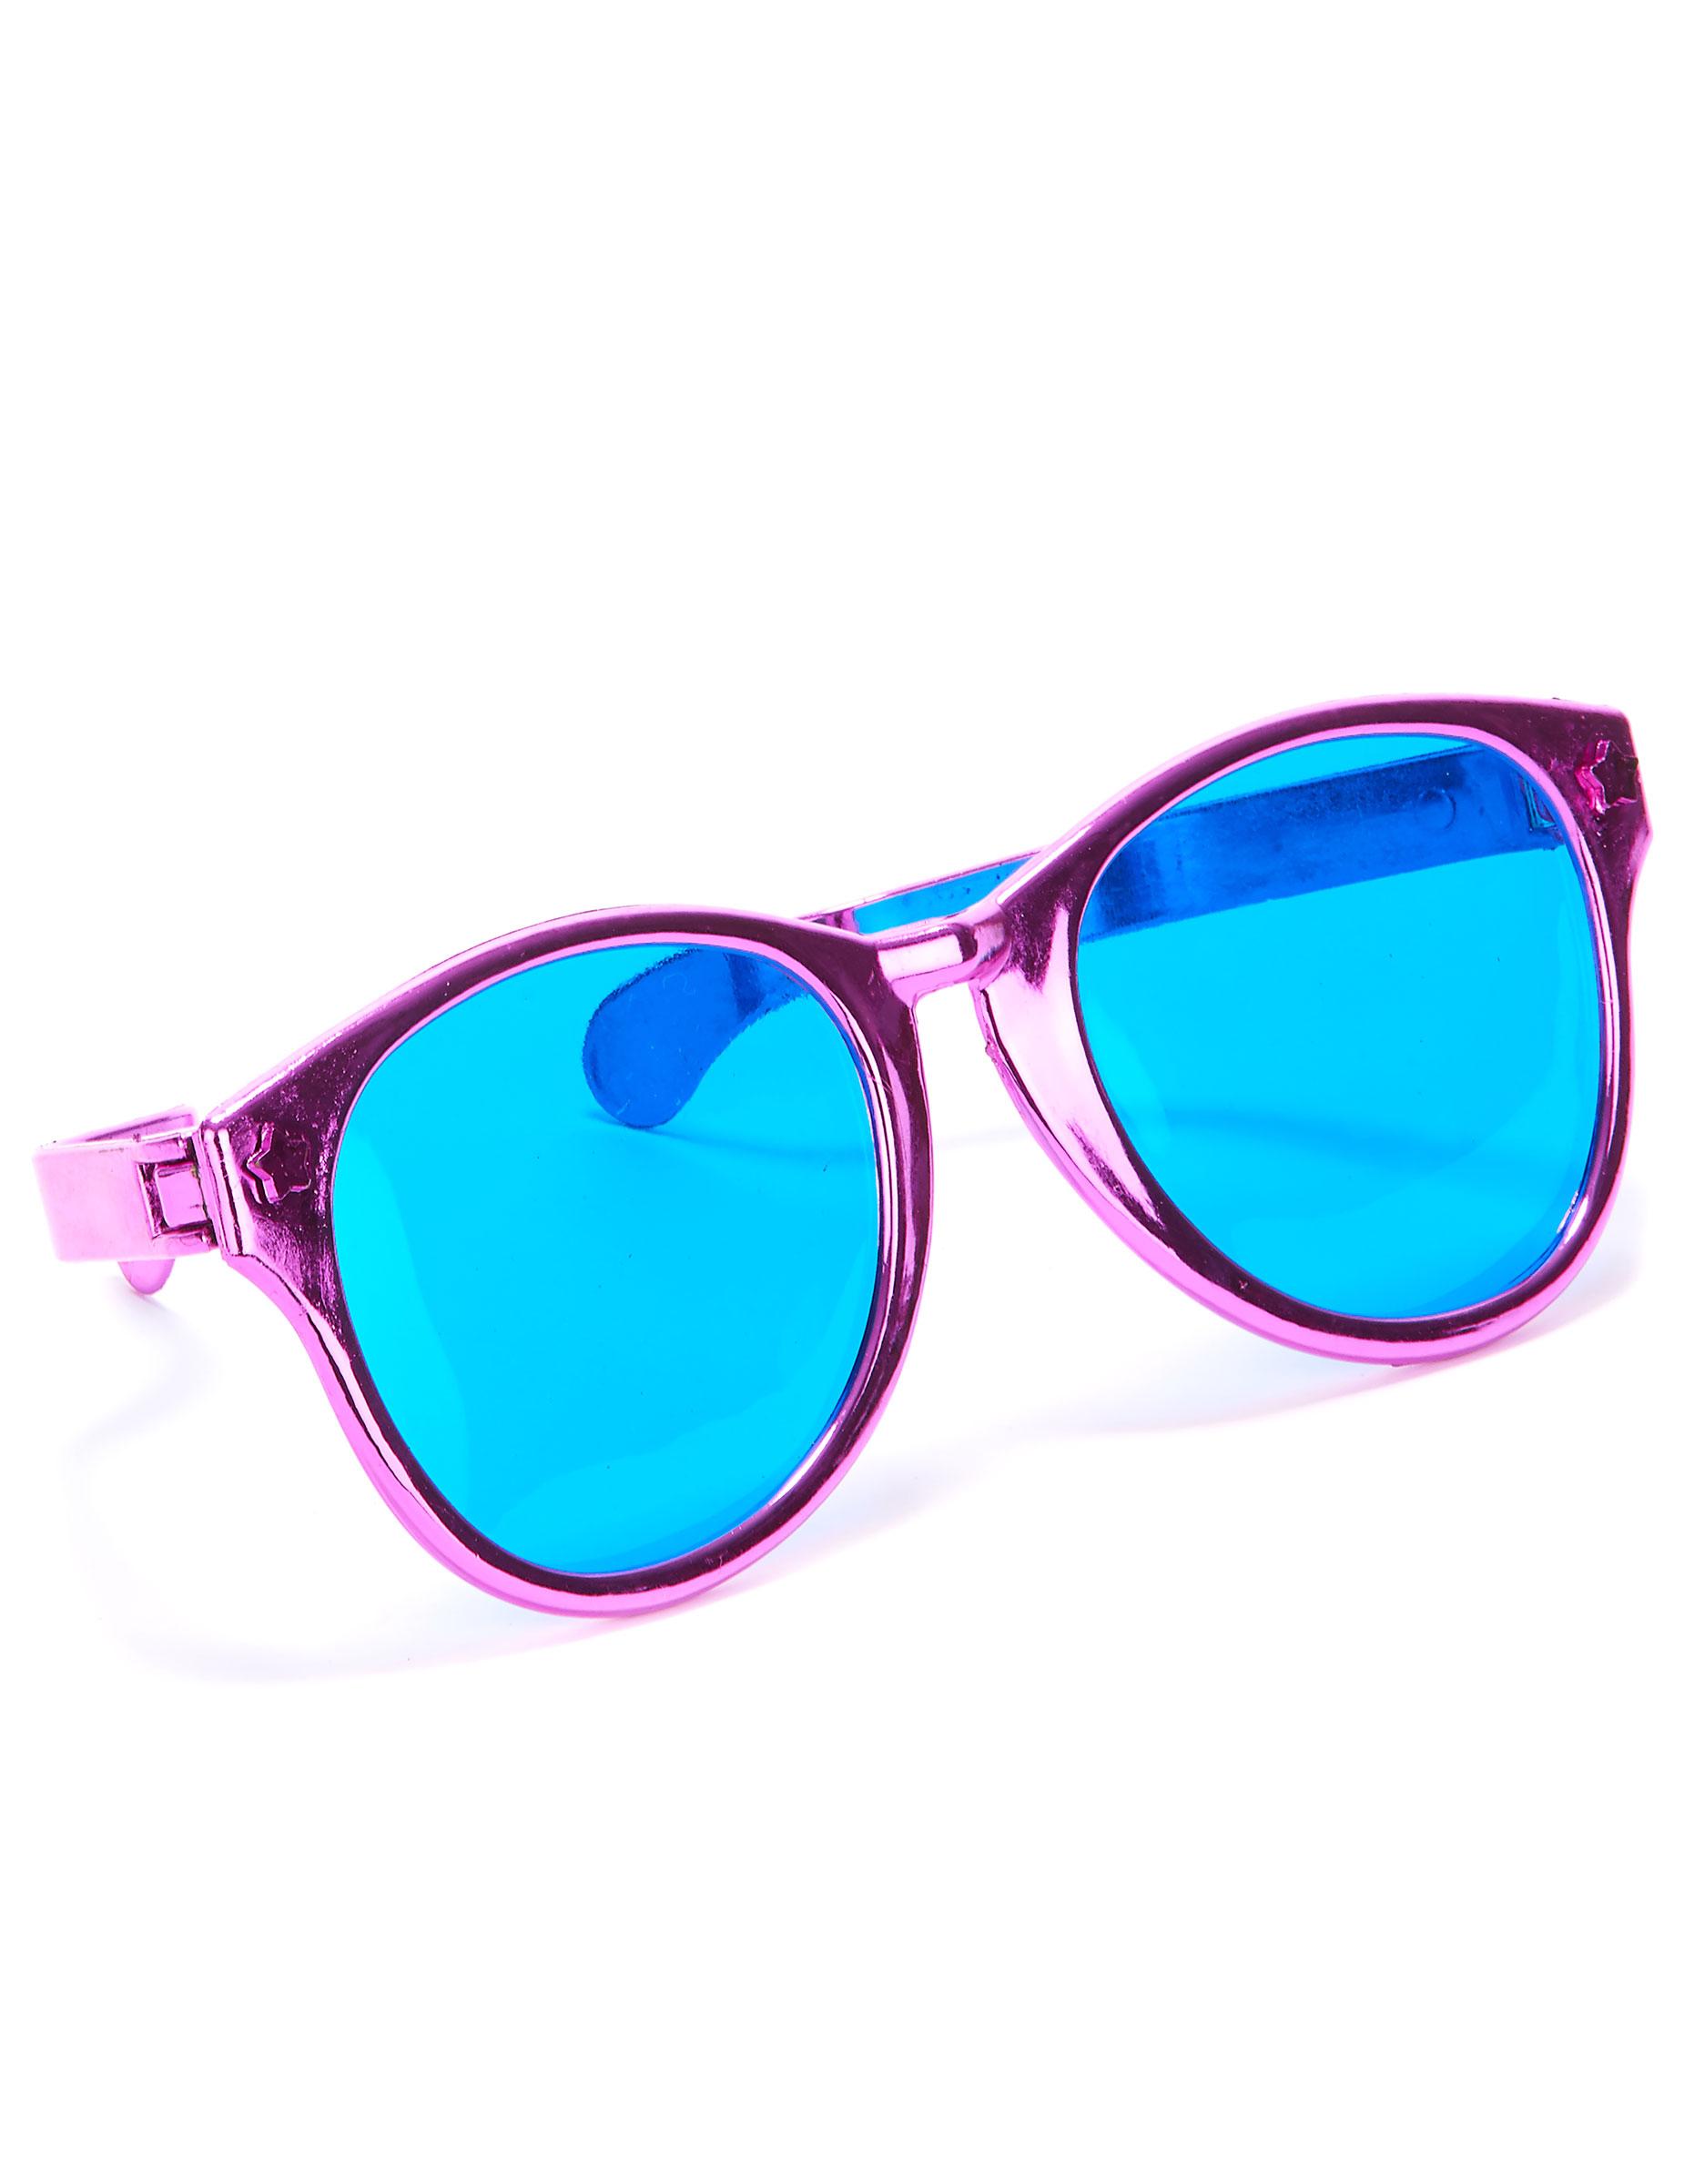 Gafas gigantes adulto rosa  Accesorios 71b9c2179423